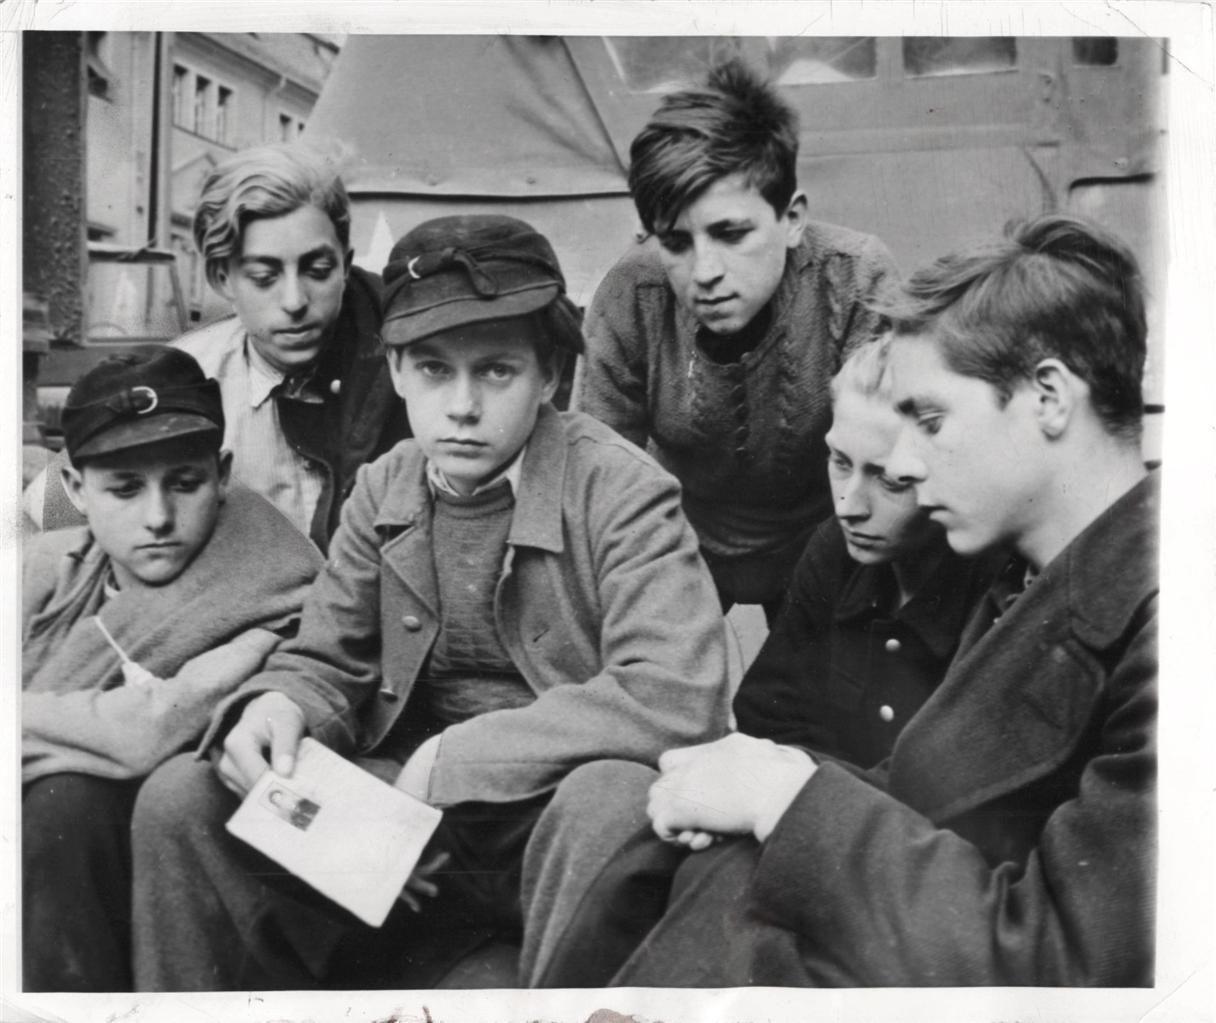 1945 German boys all members of the